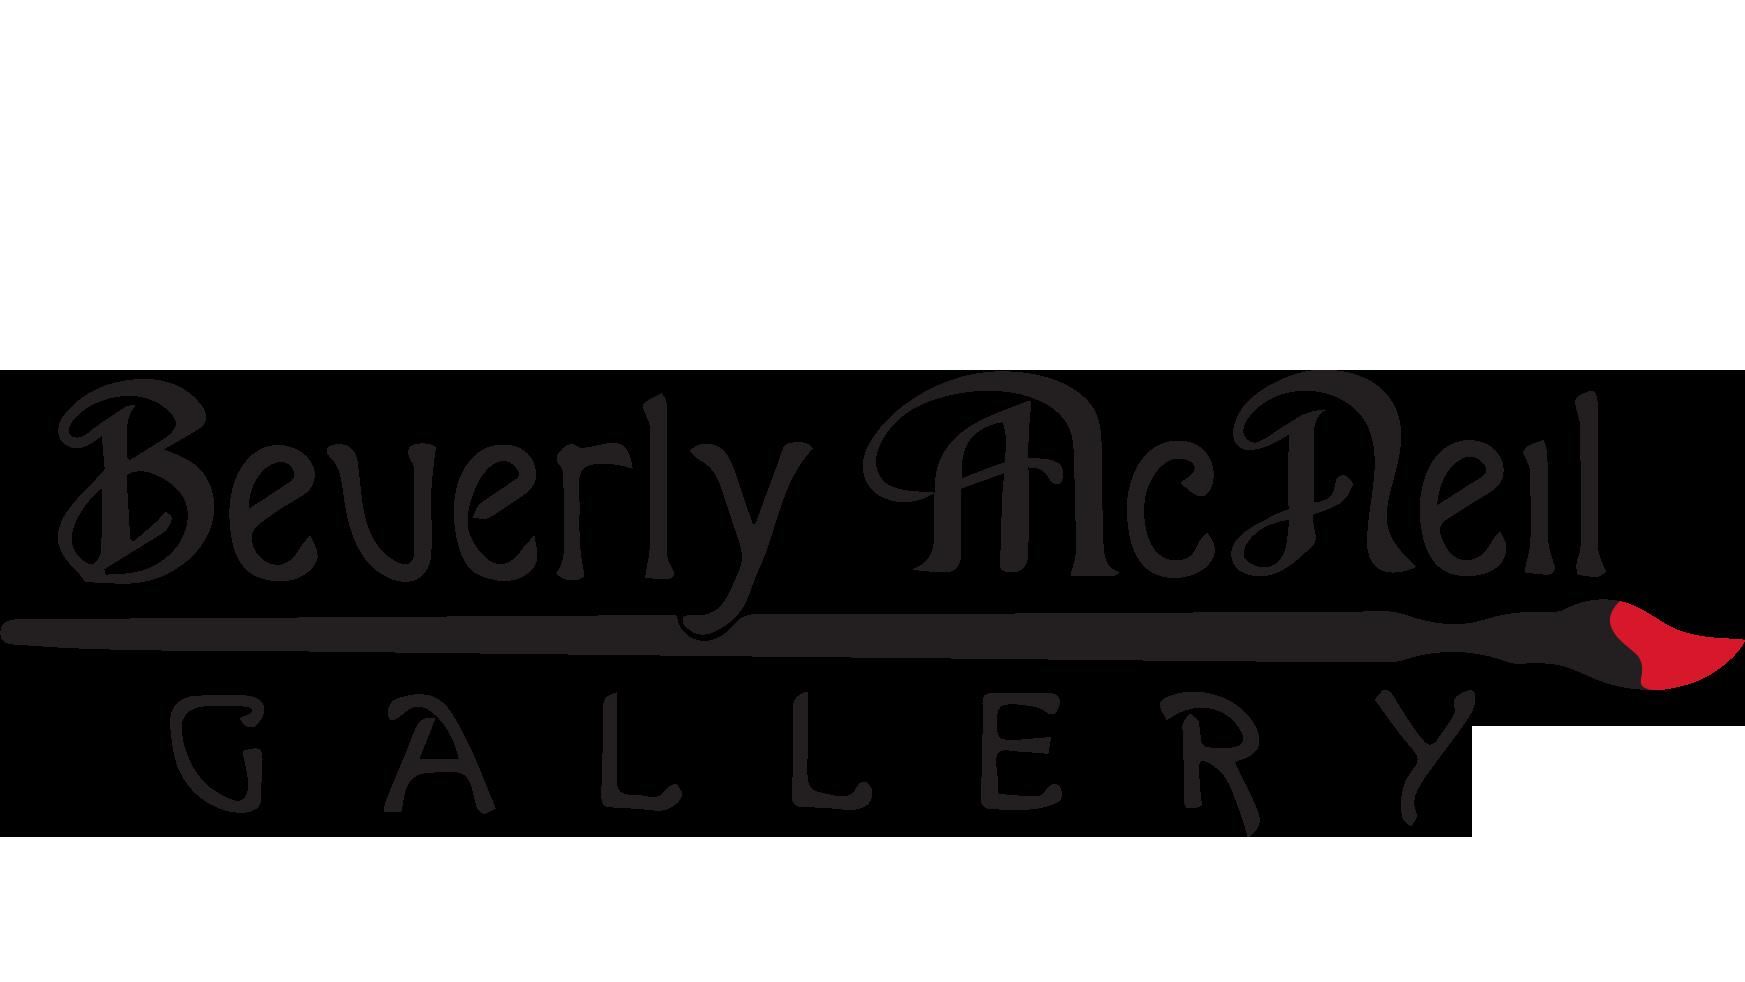 Beverly McNeil Gallery logo